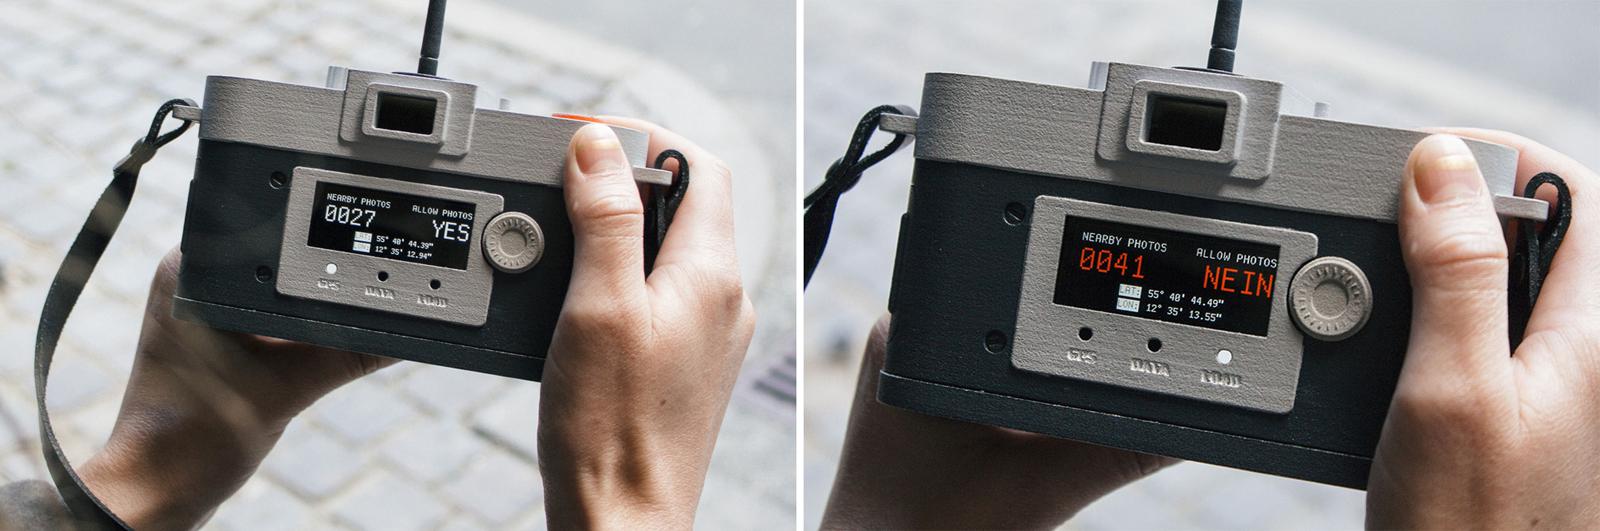 La cámara de 'Camera restricta' bloqueada y sin bloquear - Foto: philippschmitt.com